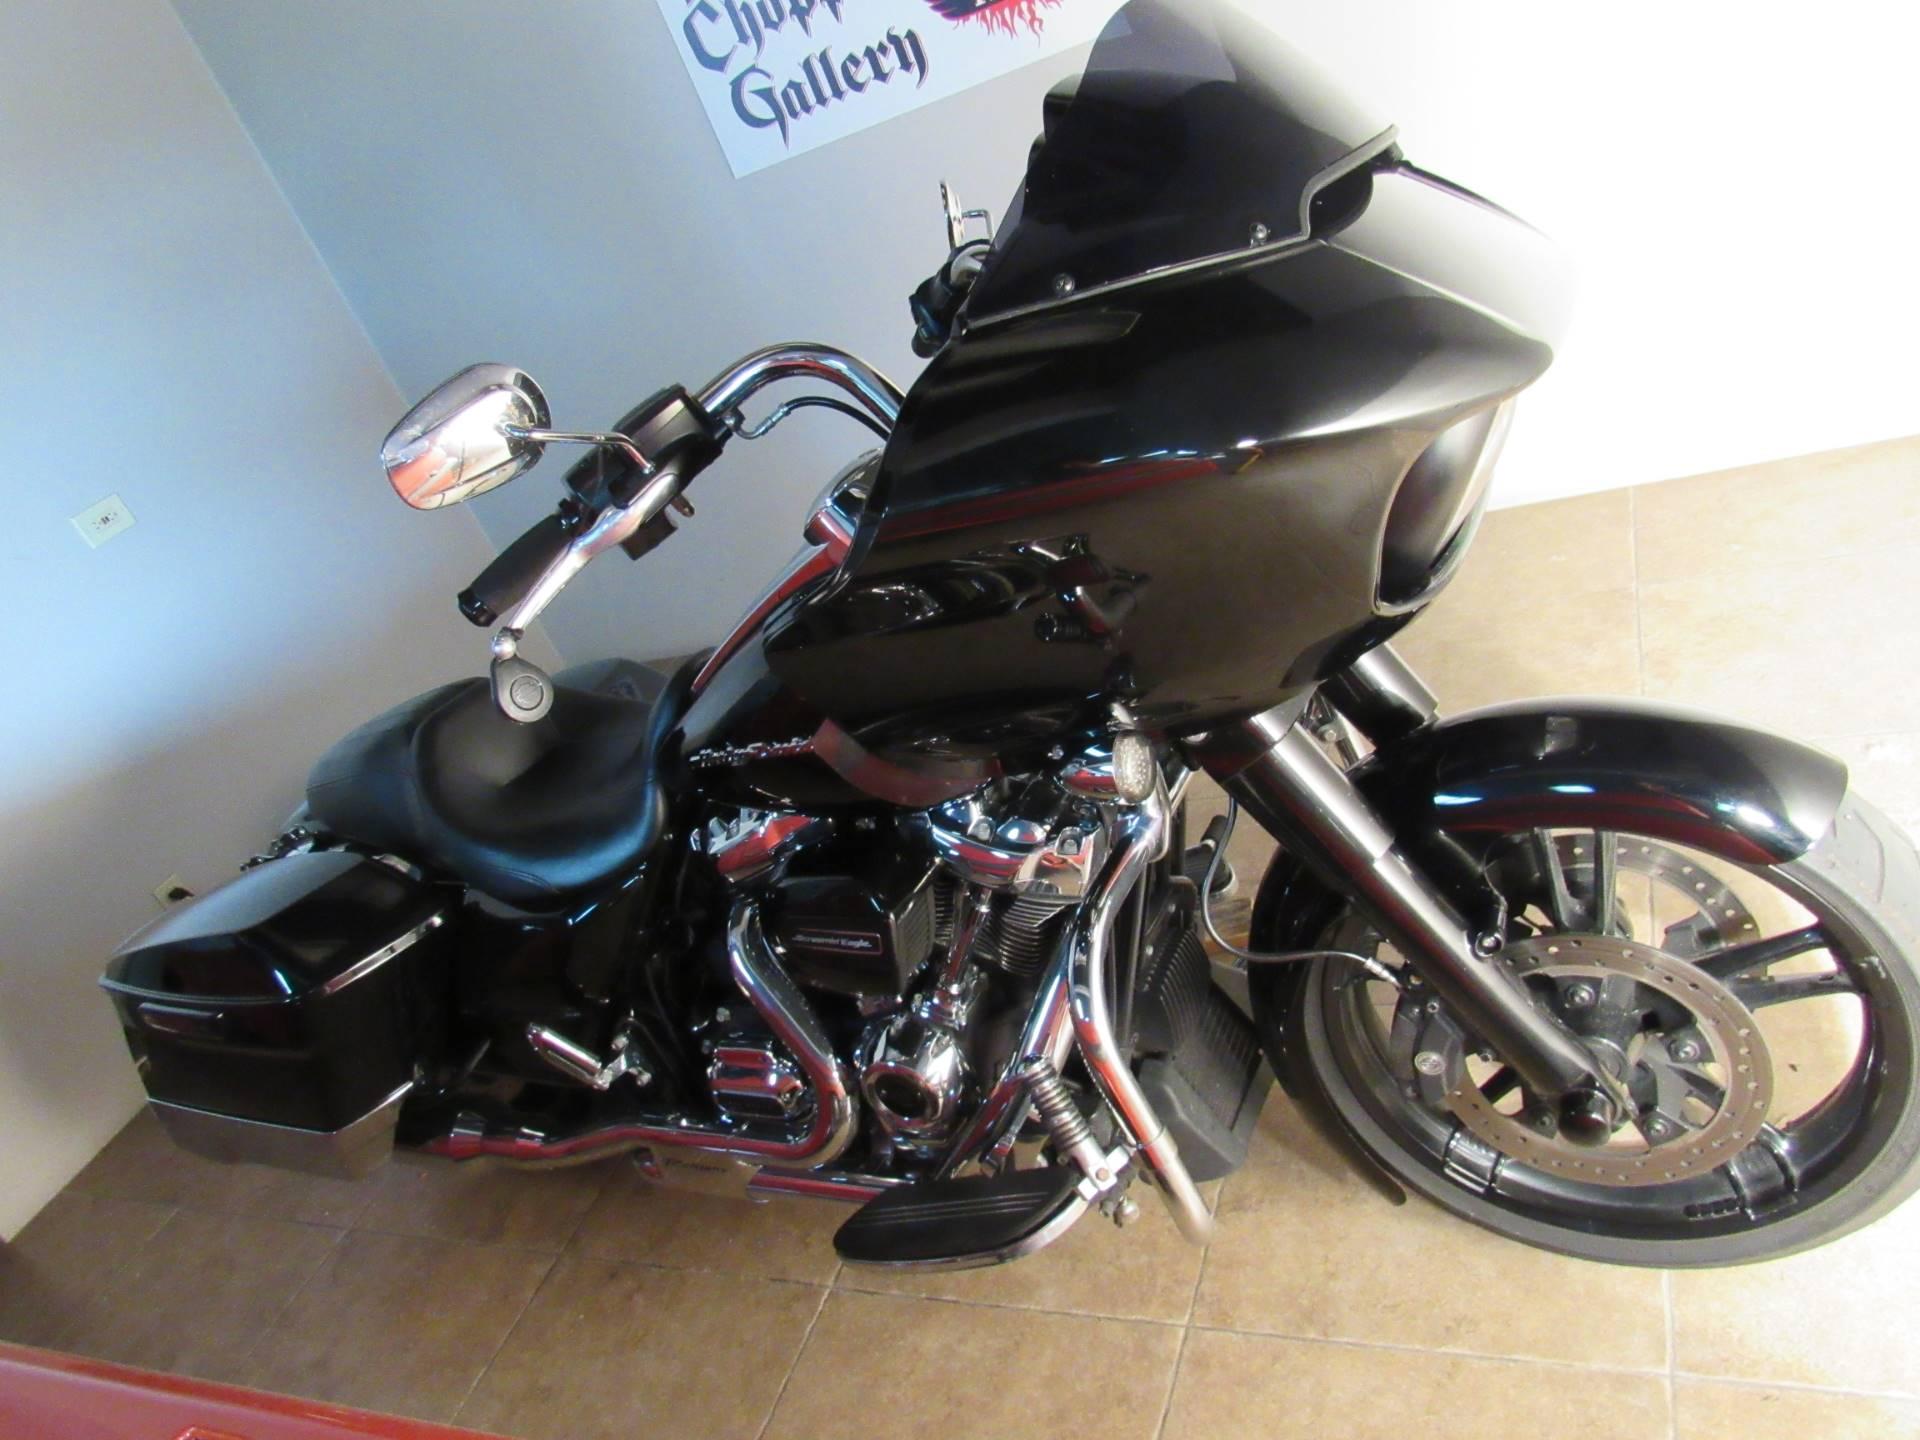 2017 Harley Davidson Road Glide Special In Temecula California